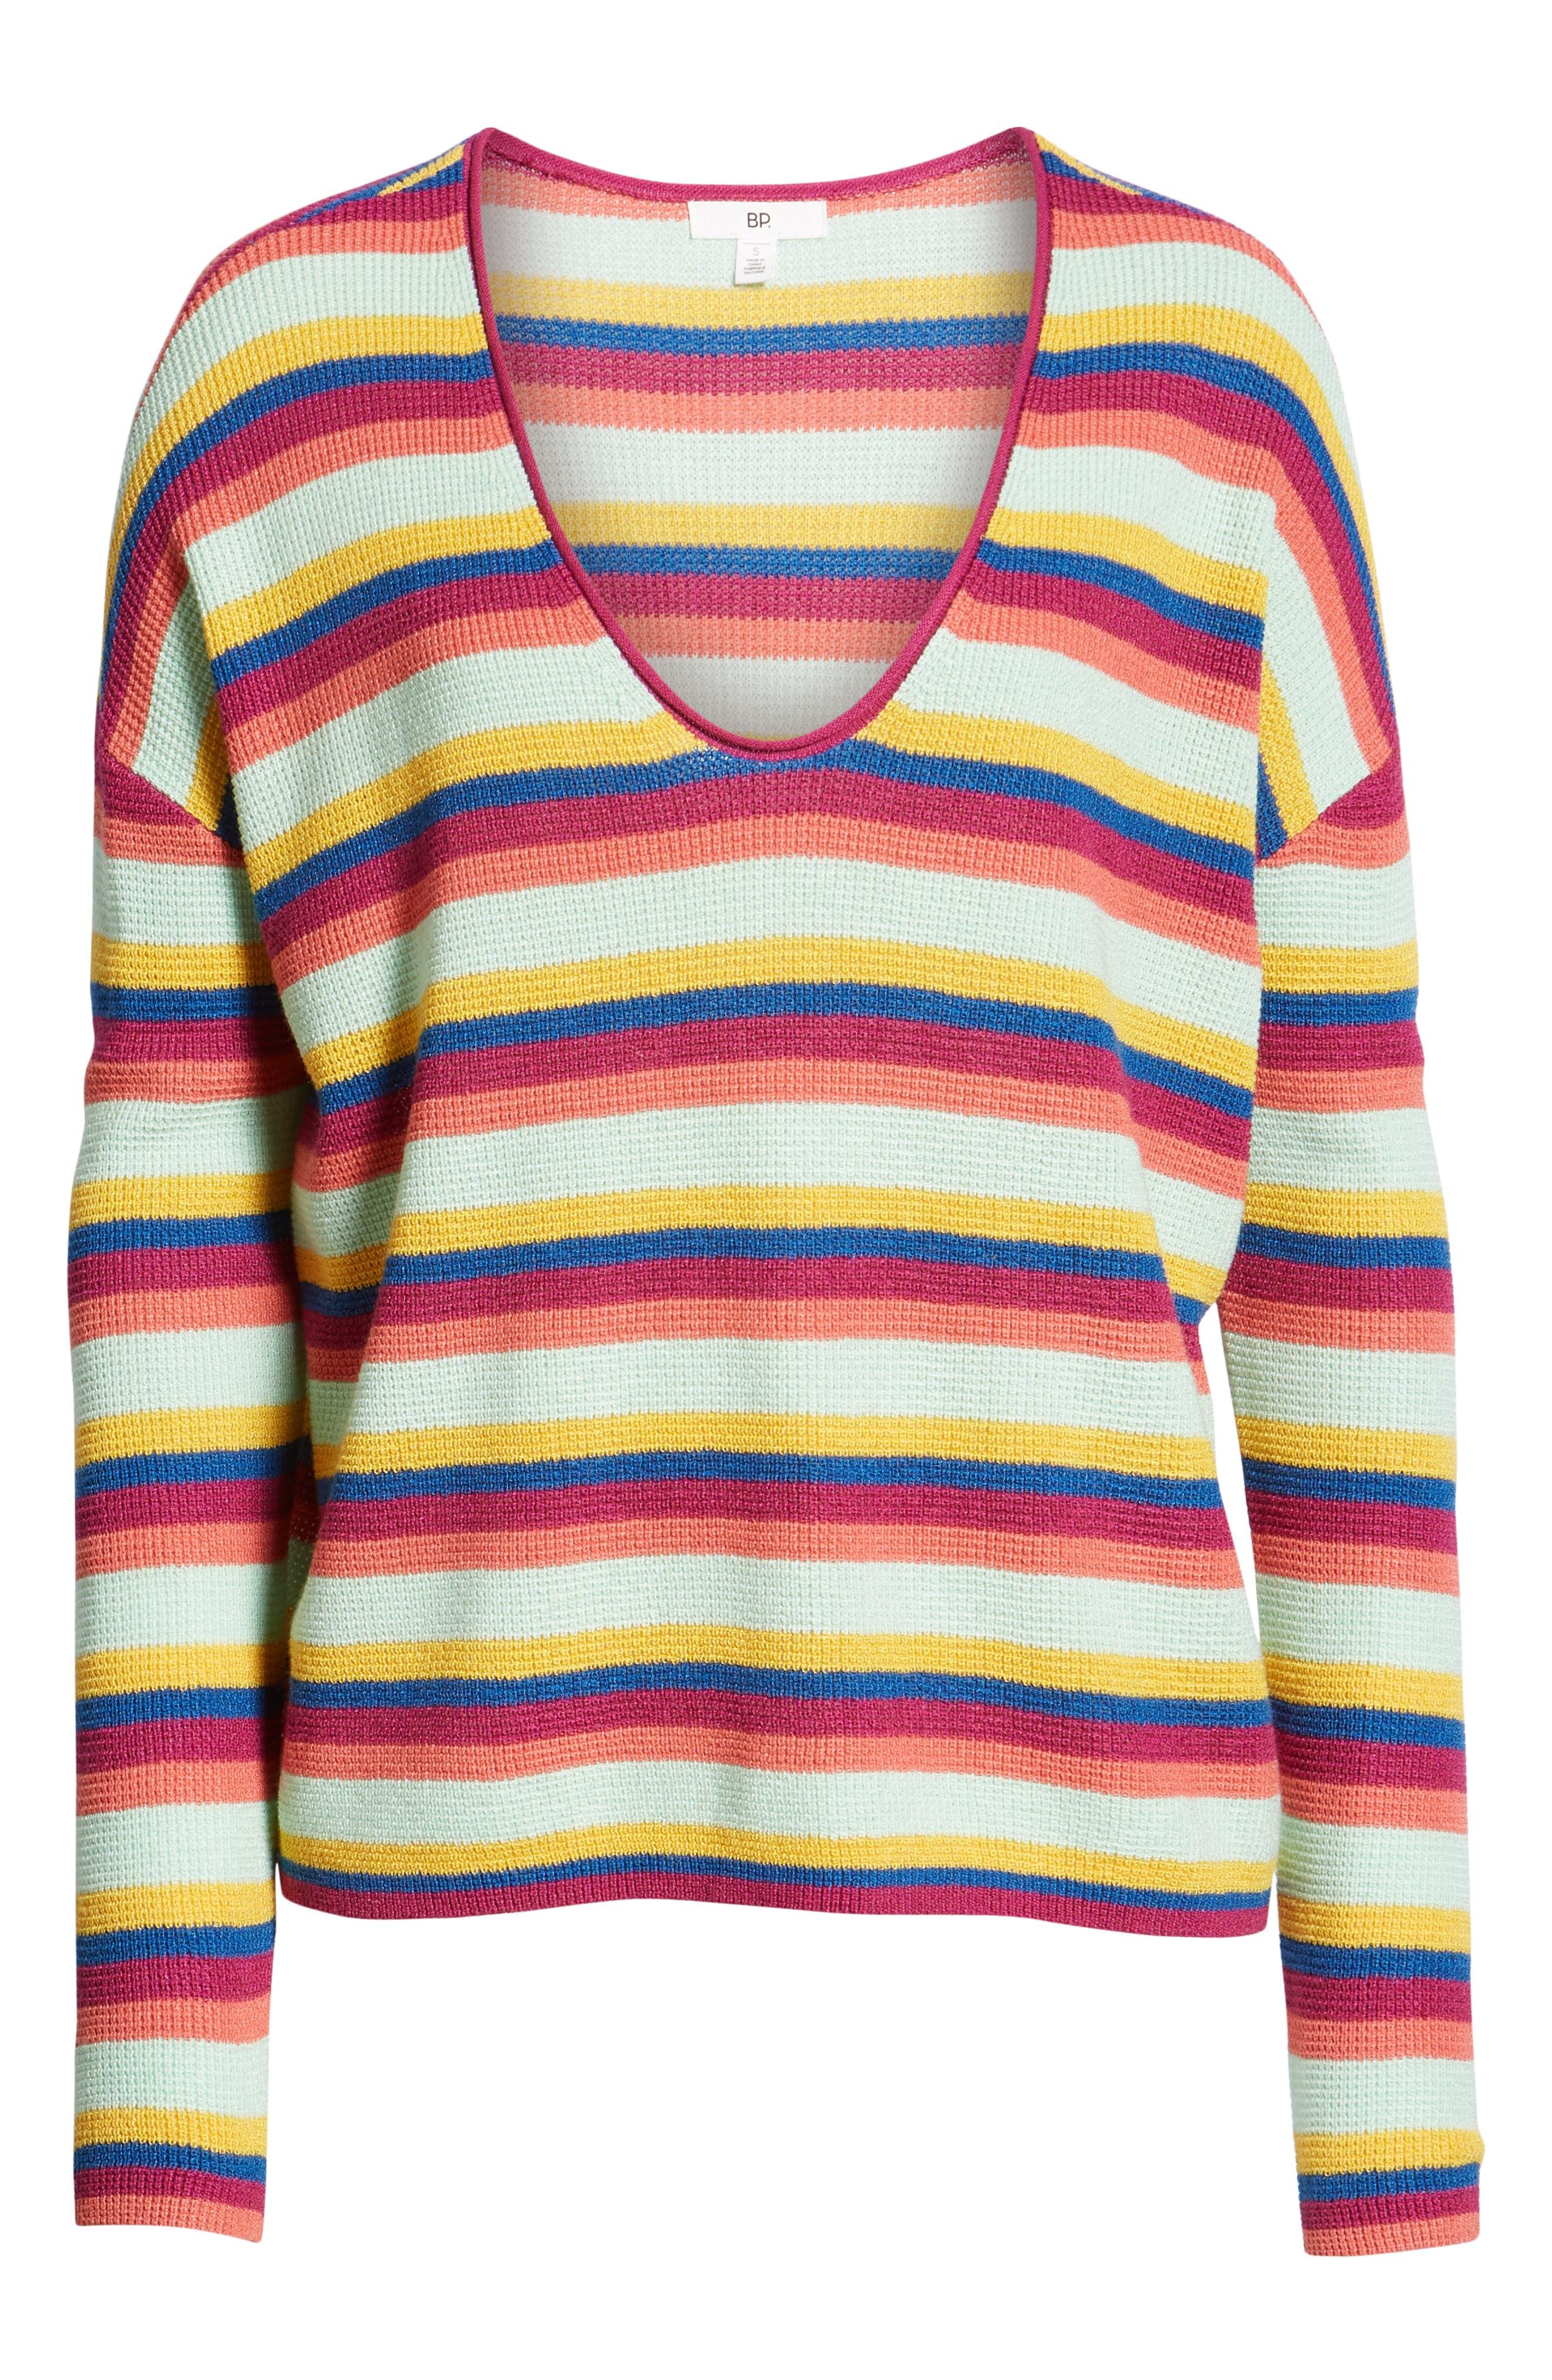 BP., Stripe Thermal Stitch Sweater, Alternate thumbnail 7, color, 660